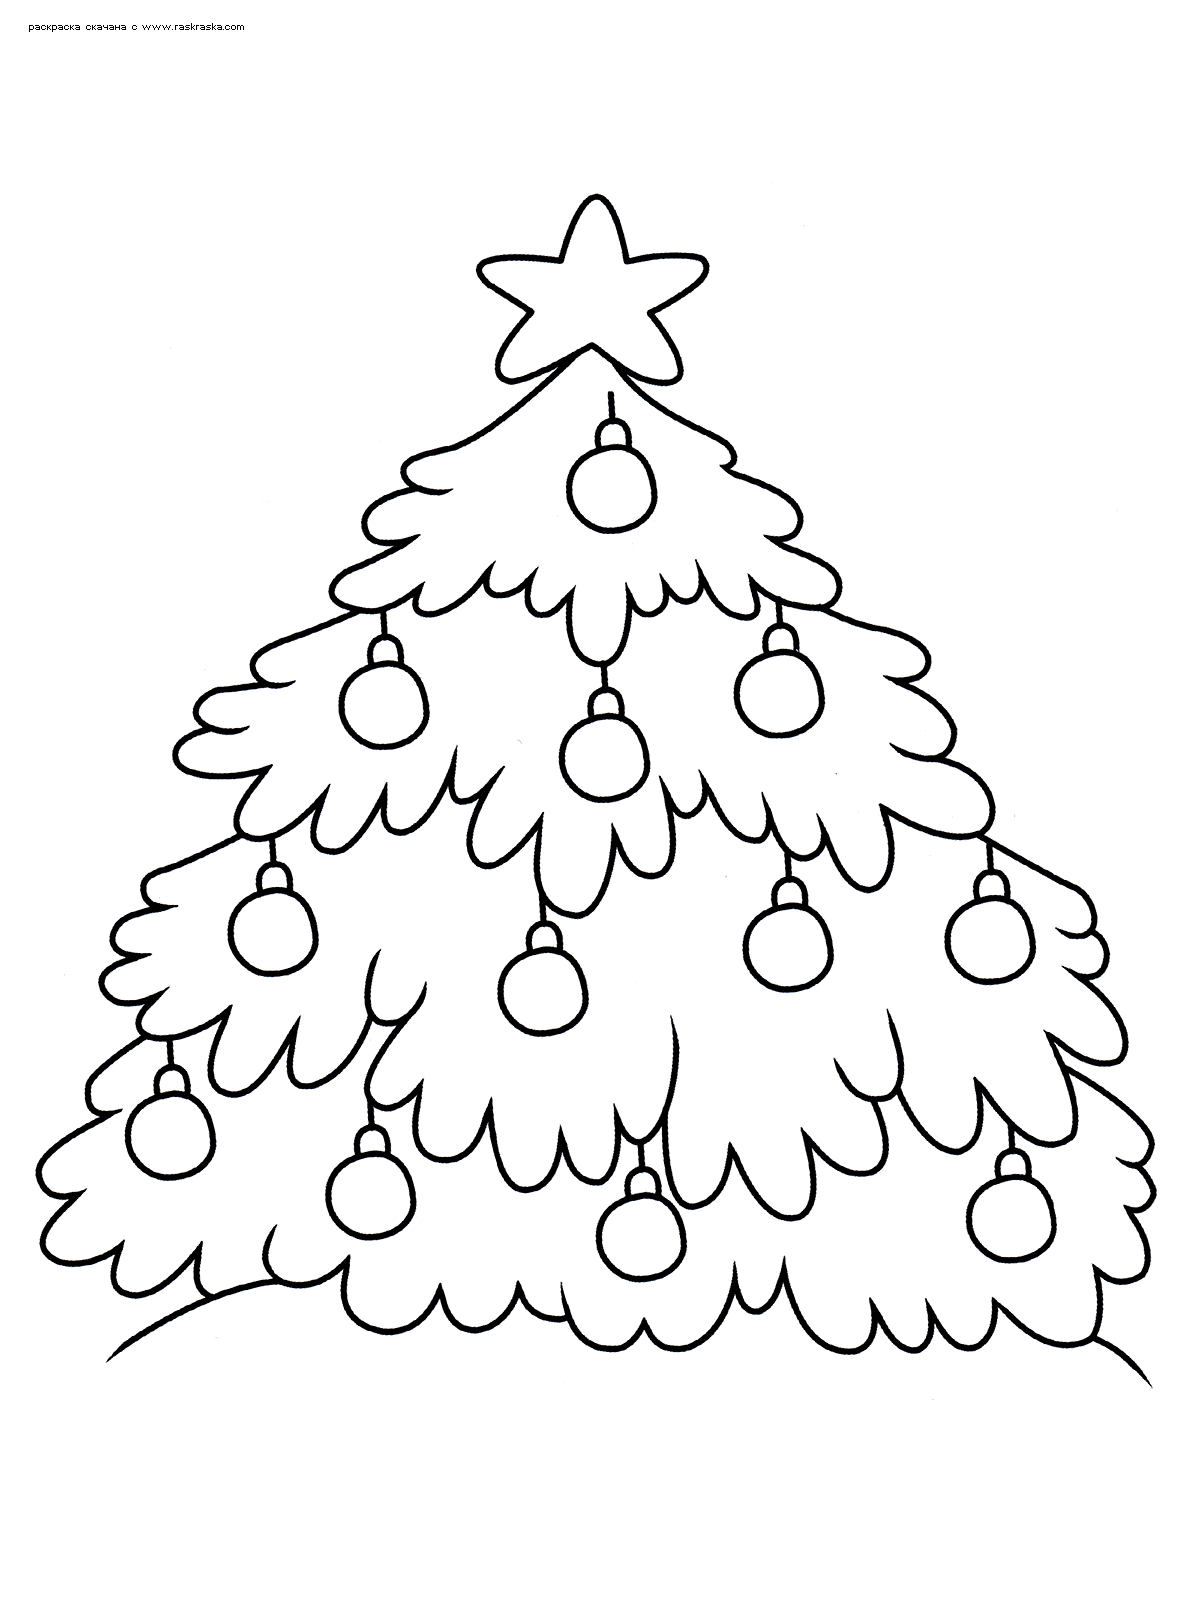 Раскраска Нарядная елка. Раскраска елка